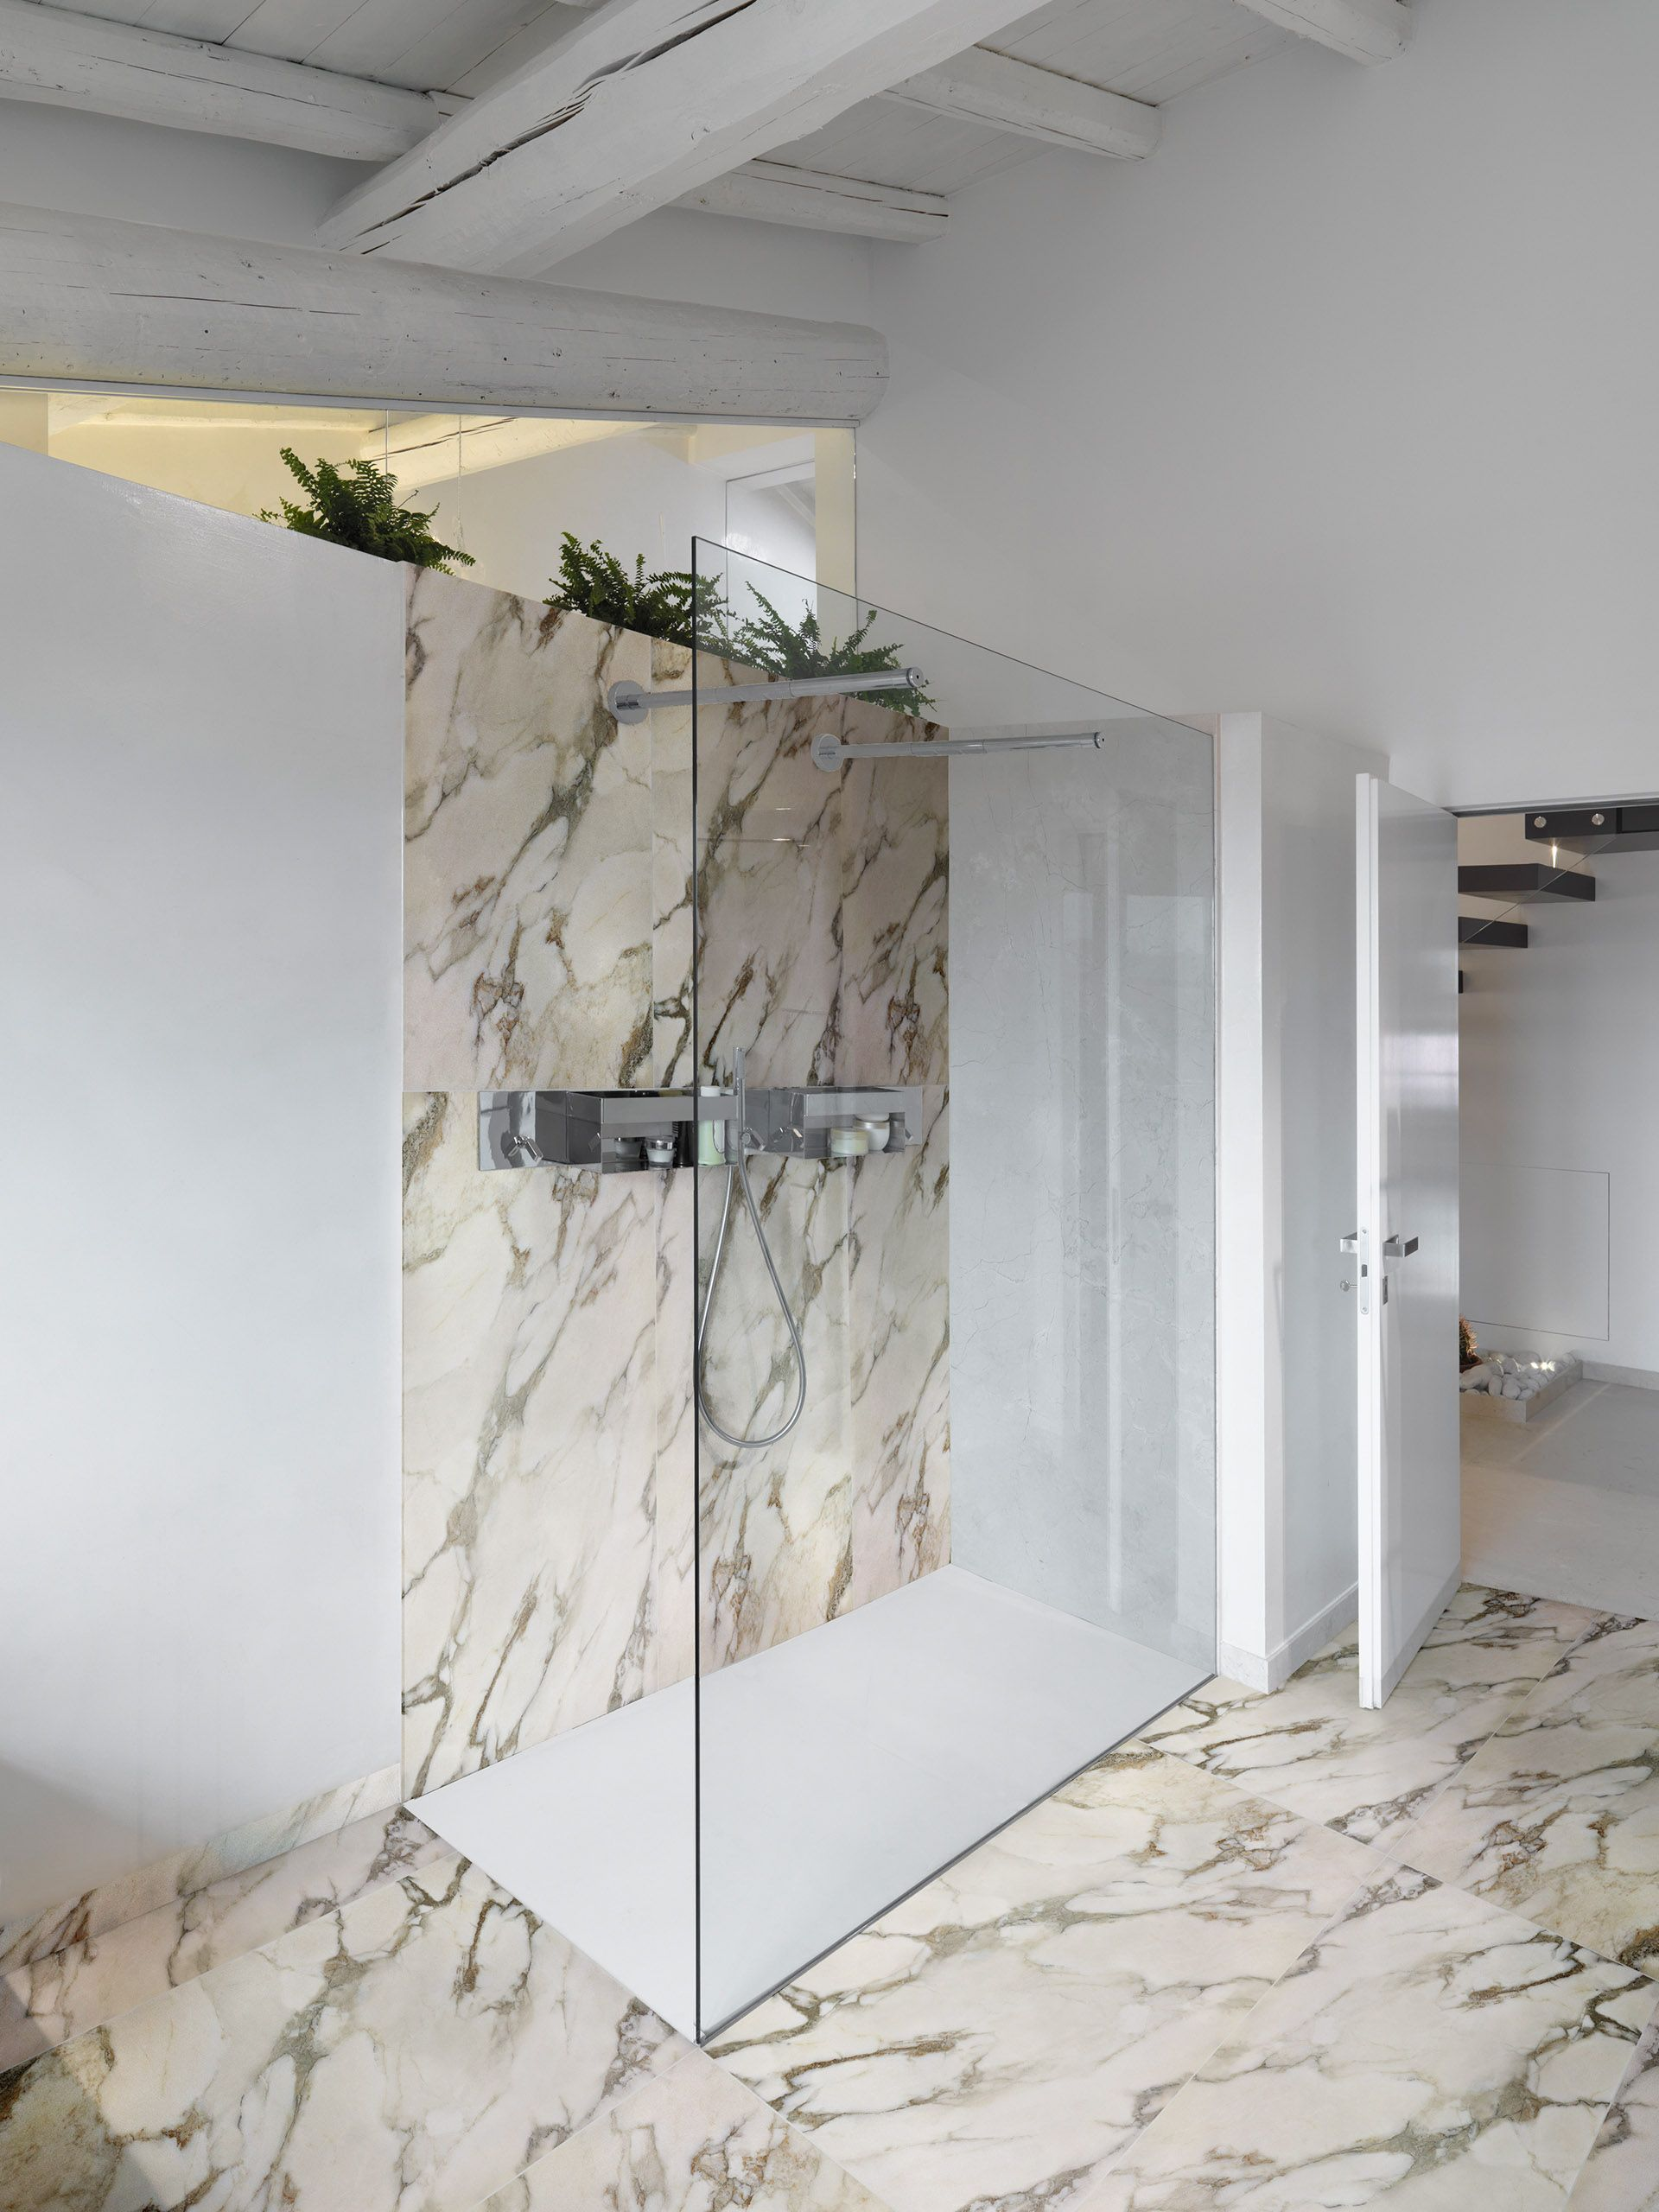 Super Snow White Decor Home Decor Room Divider